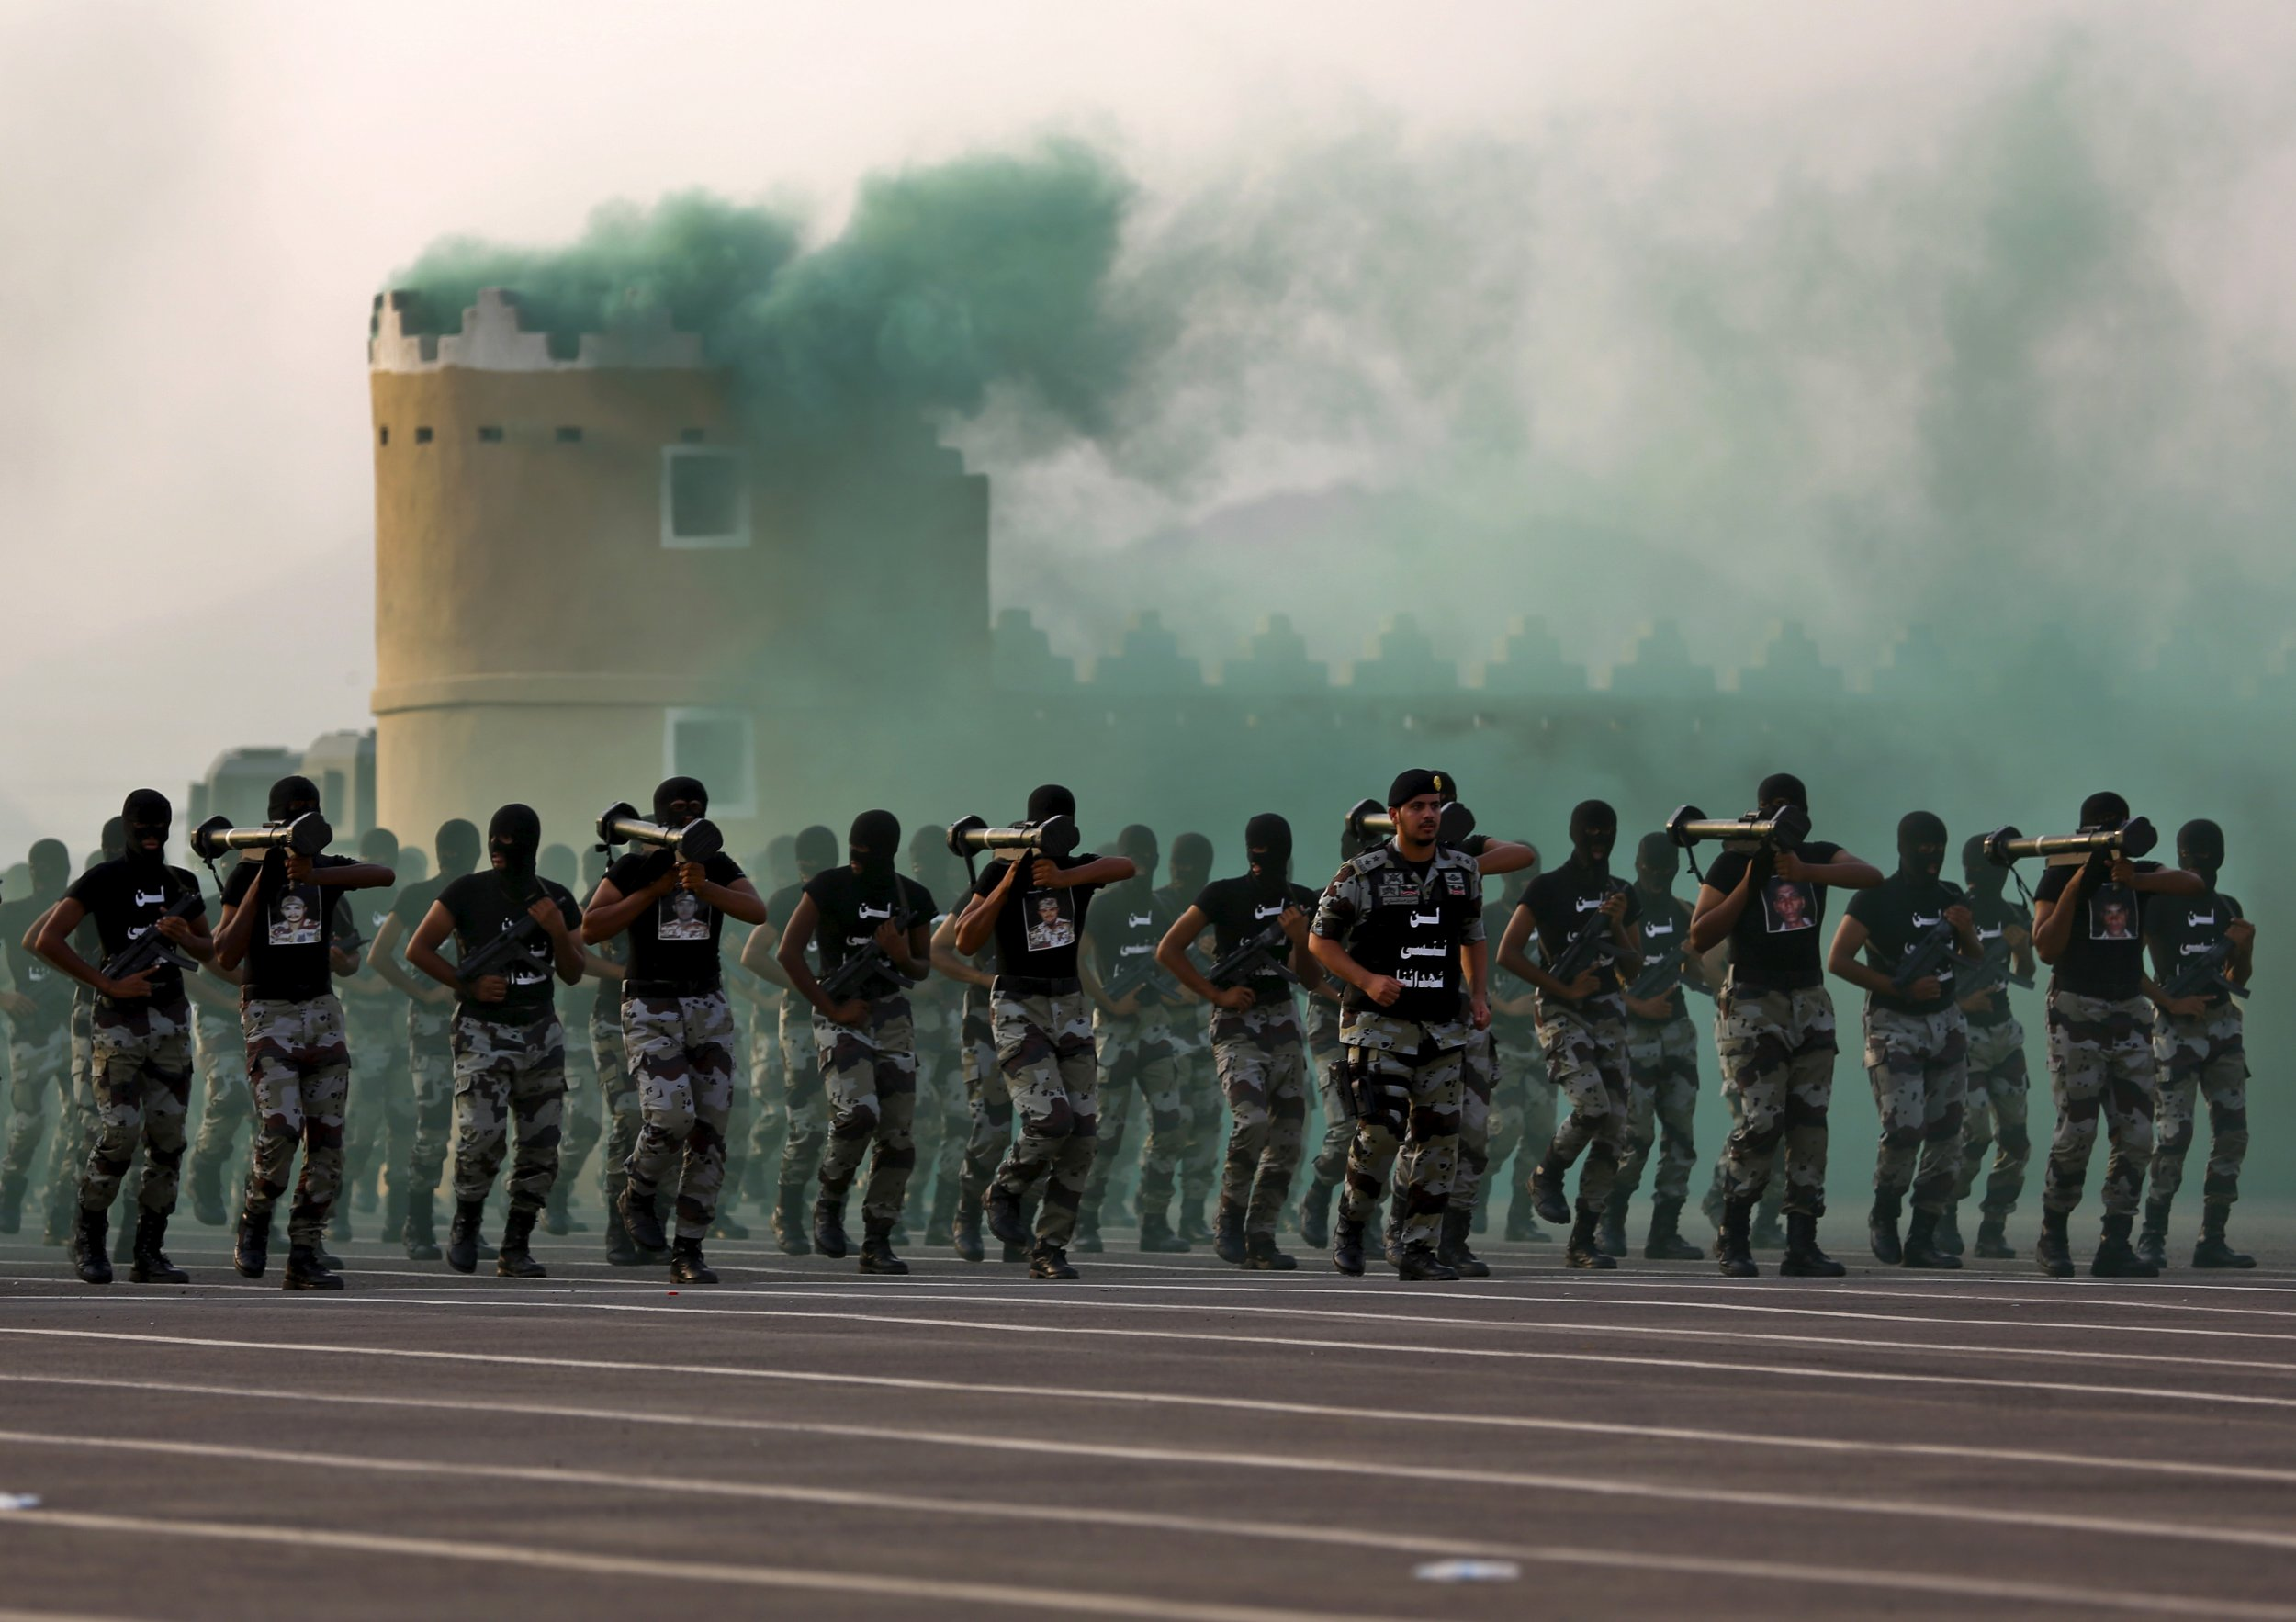 Saudi Arabia security